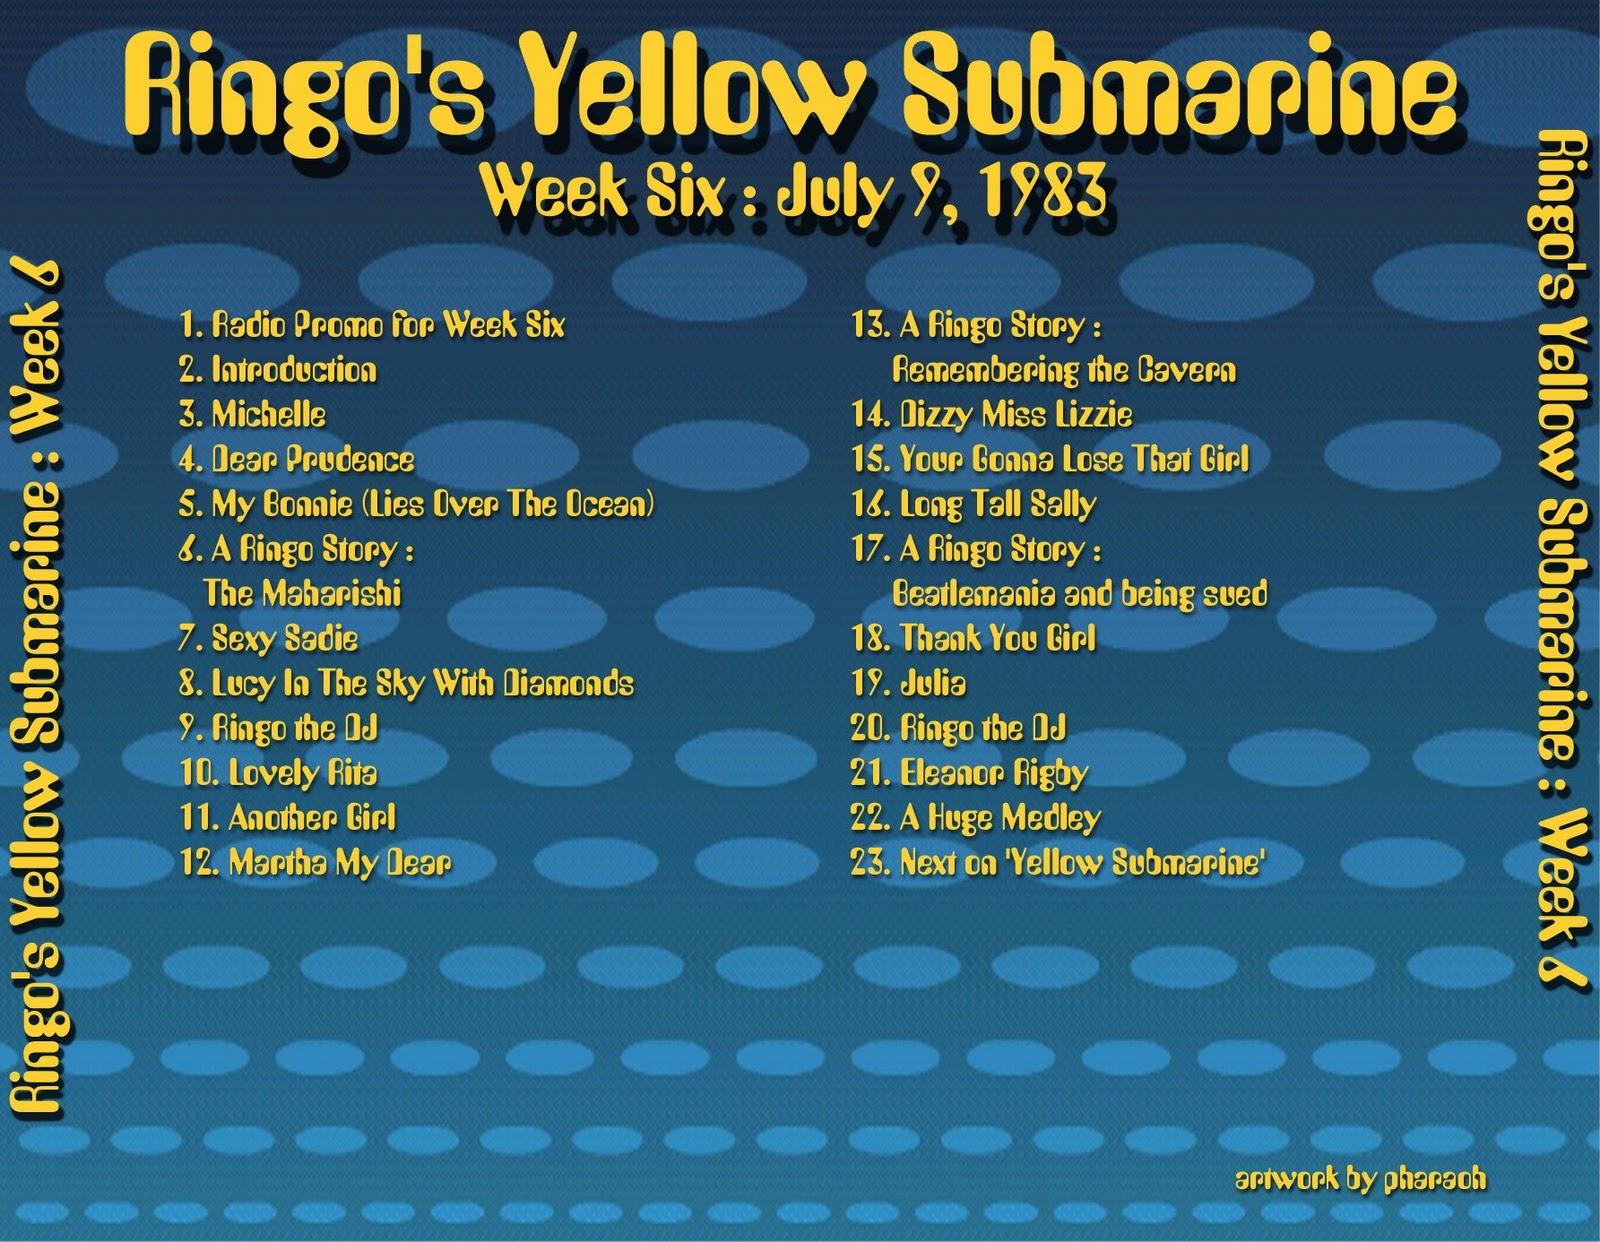 Beatles Radio Waves: 1983 07 09 Ringo's Yellow Submarine 06 #B99A12 1600 1242